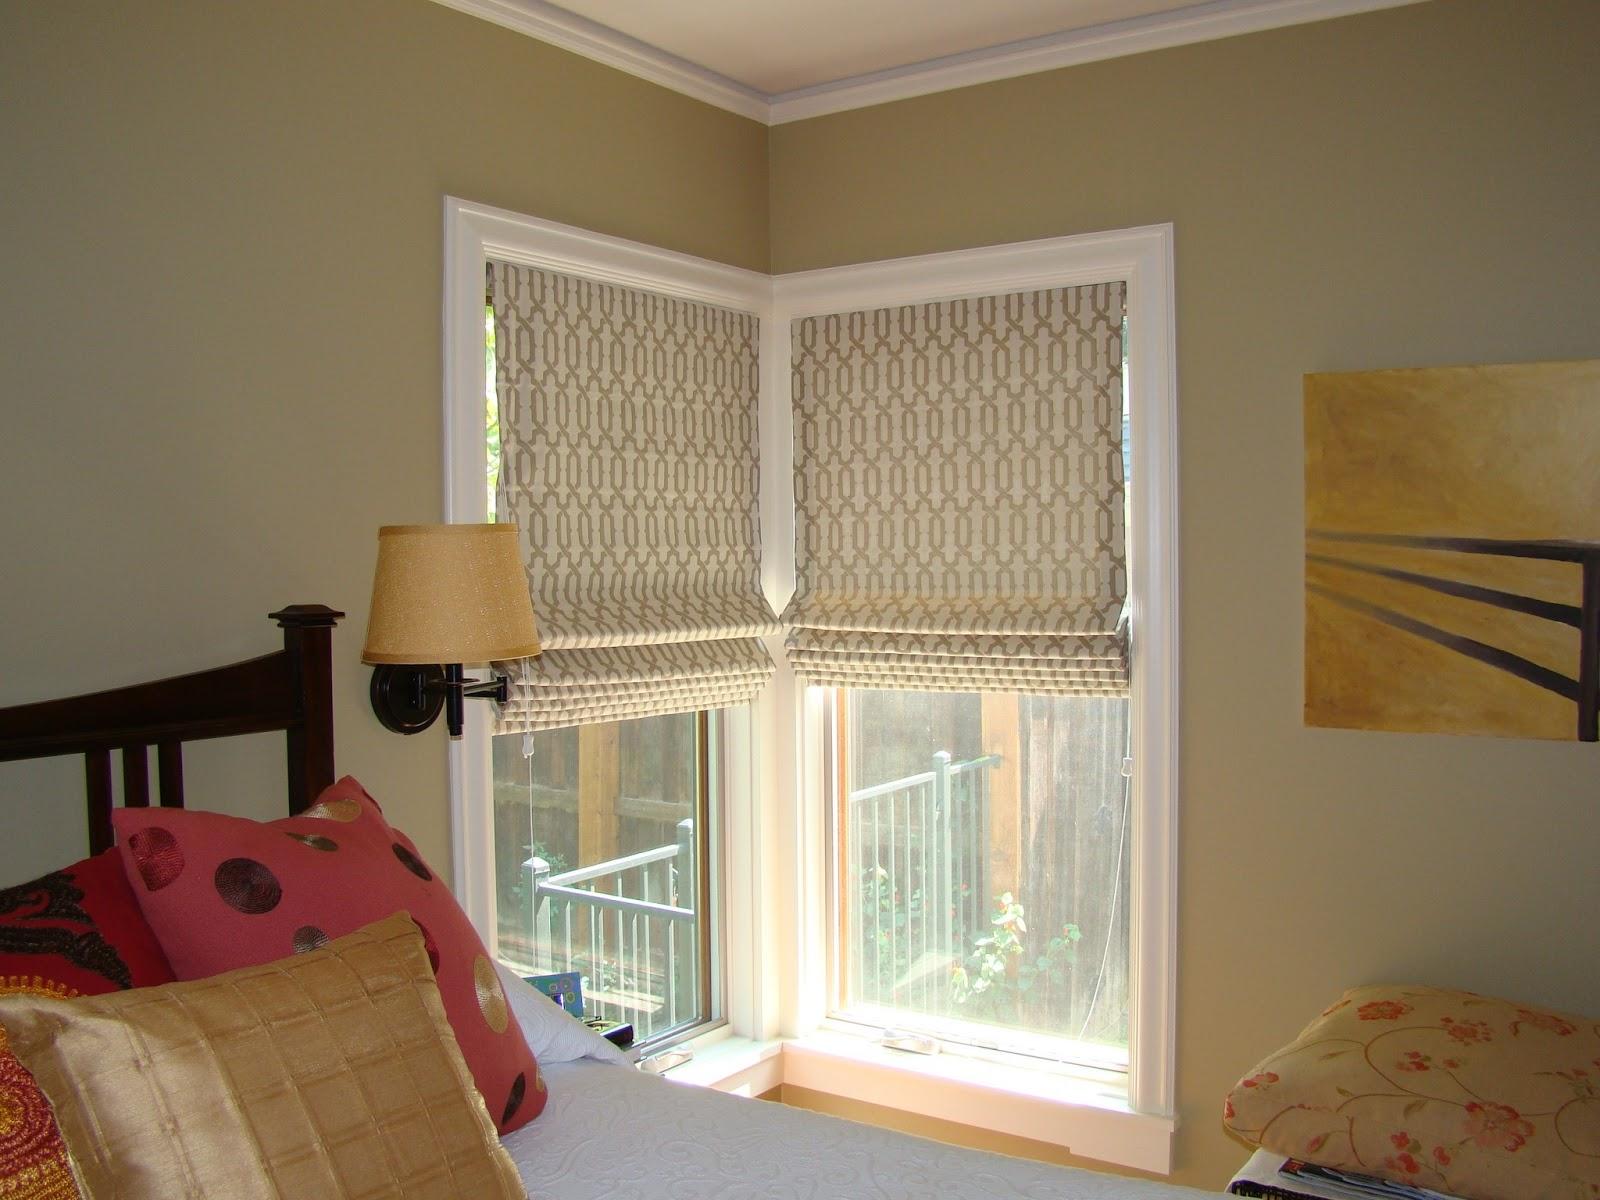 Avenue window fashions modern roman shades dallas texas for Window fashions of texas